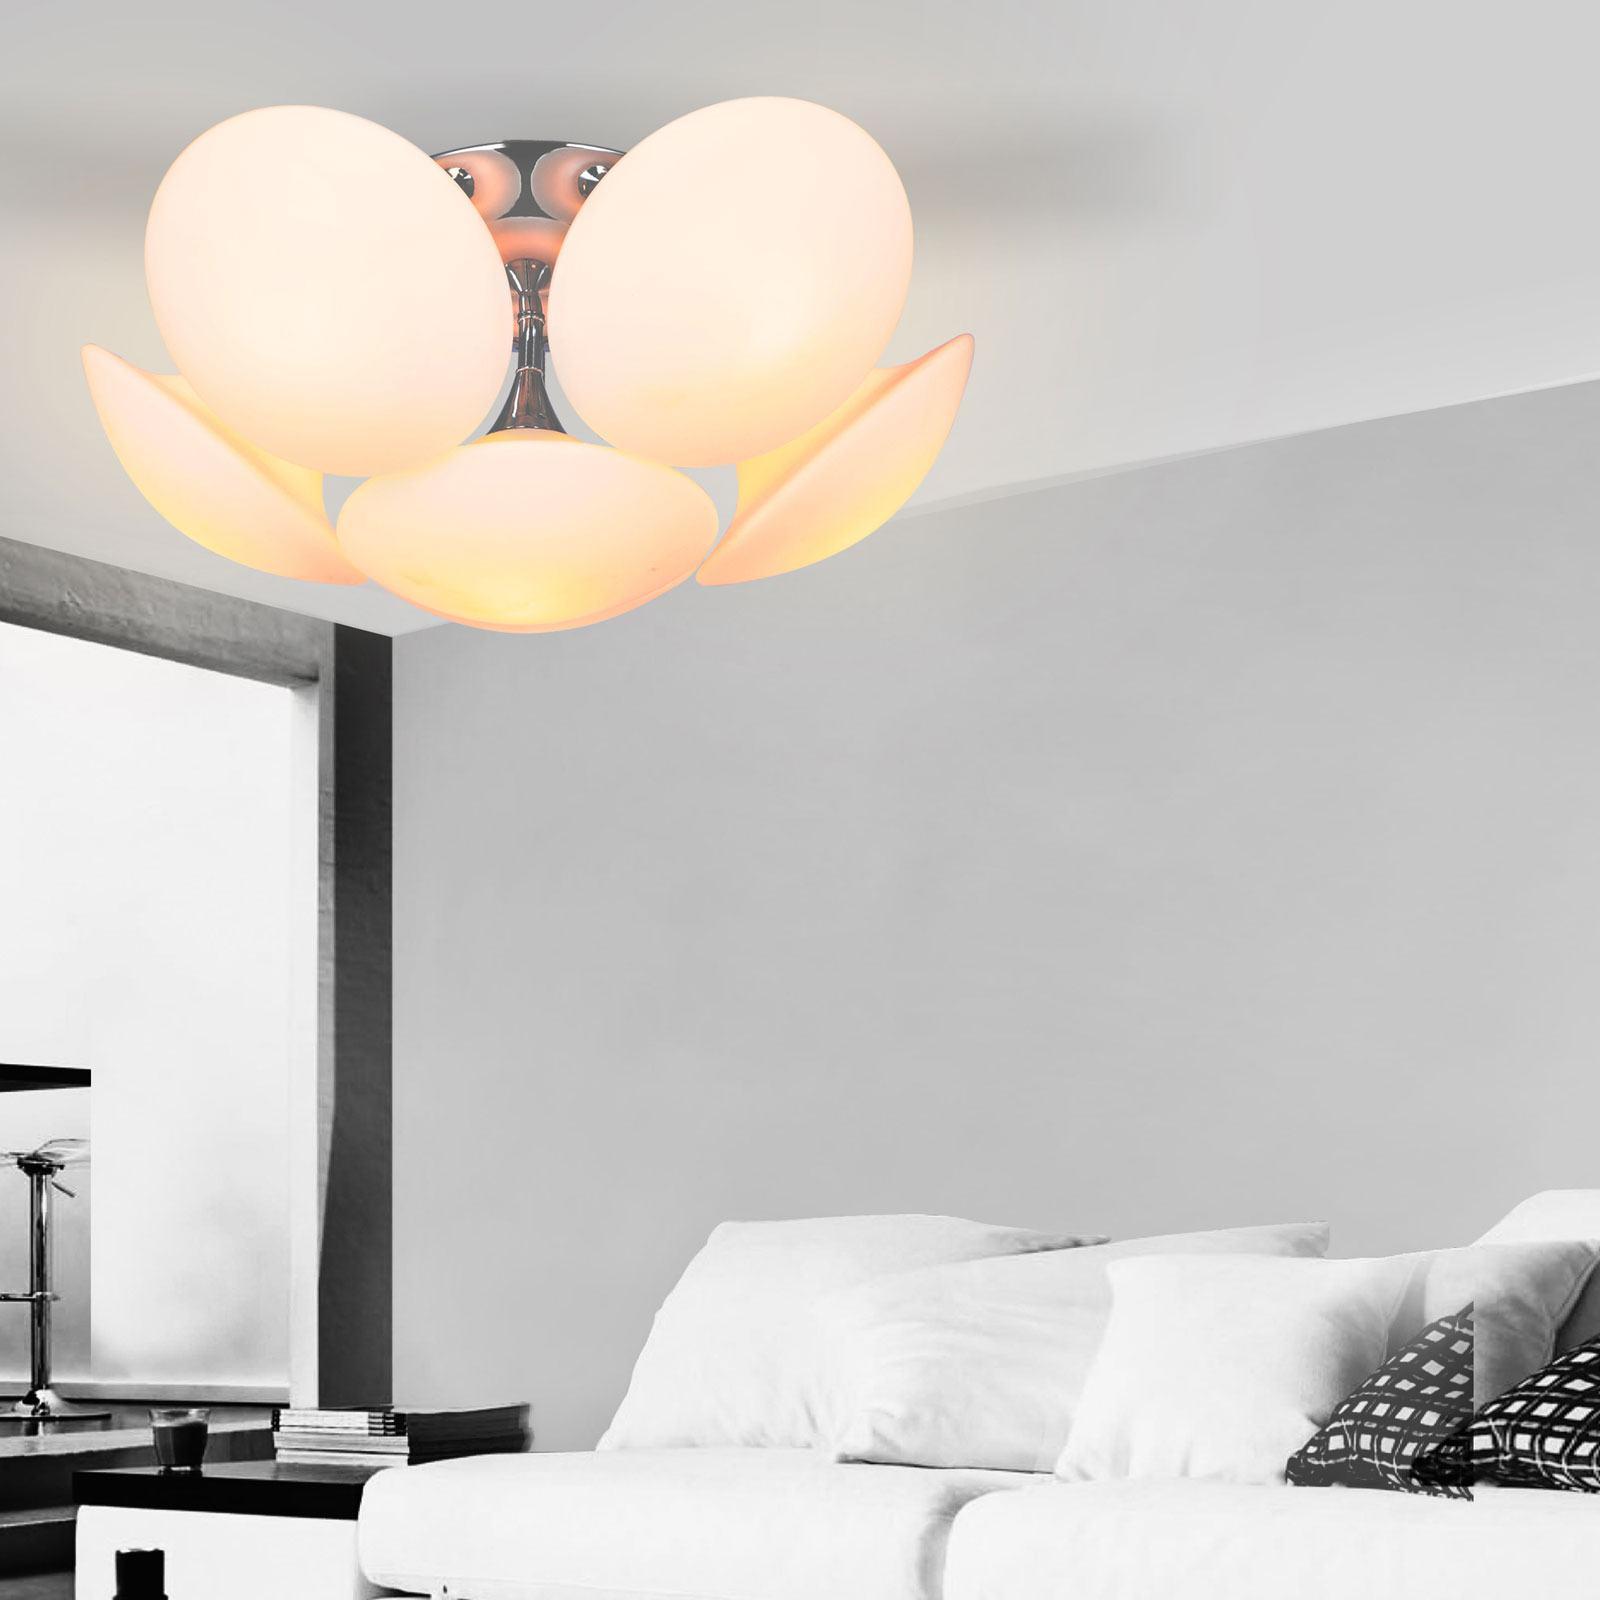 Full Size of Amazon Led Deckenleuchte Wohnzimmer Poco Moderne Dimmbare Lampe Ring Designer Dimmbar Obi Einbau Deckenleuchten Wohnzimmerleuchten Wohnzimmerlampe Bilder Wohnzimmer Deckenleuchte Led Wohnzimmer